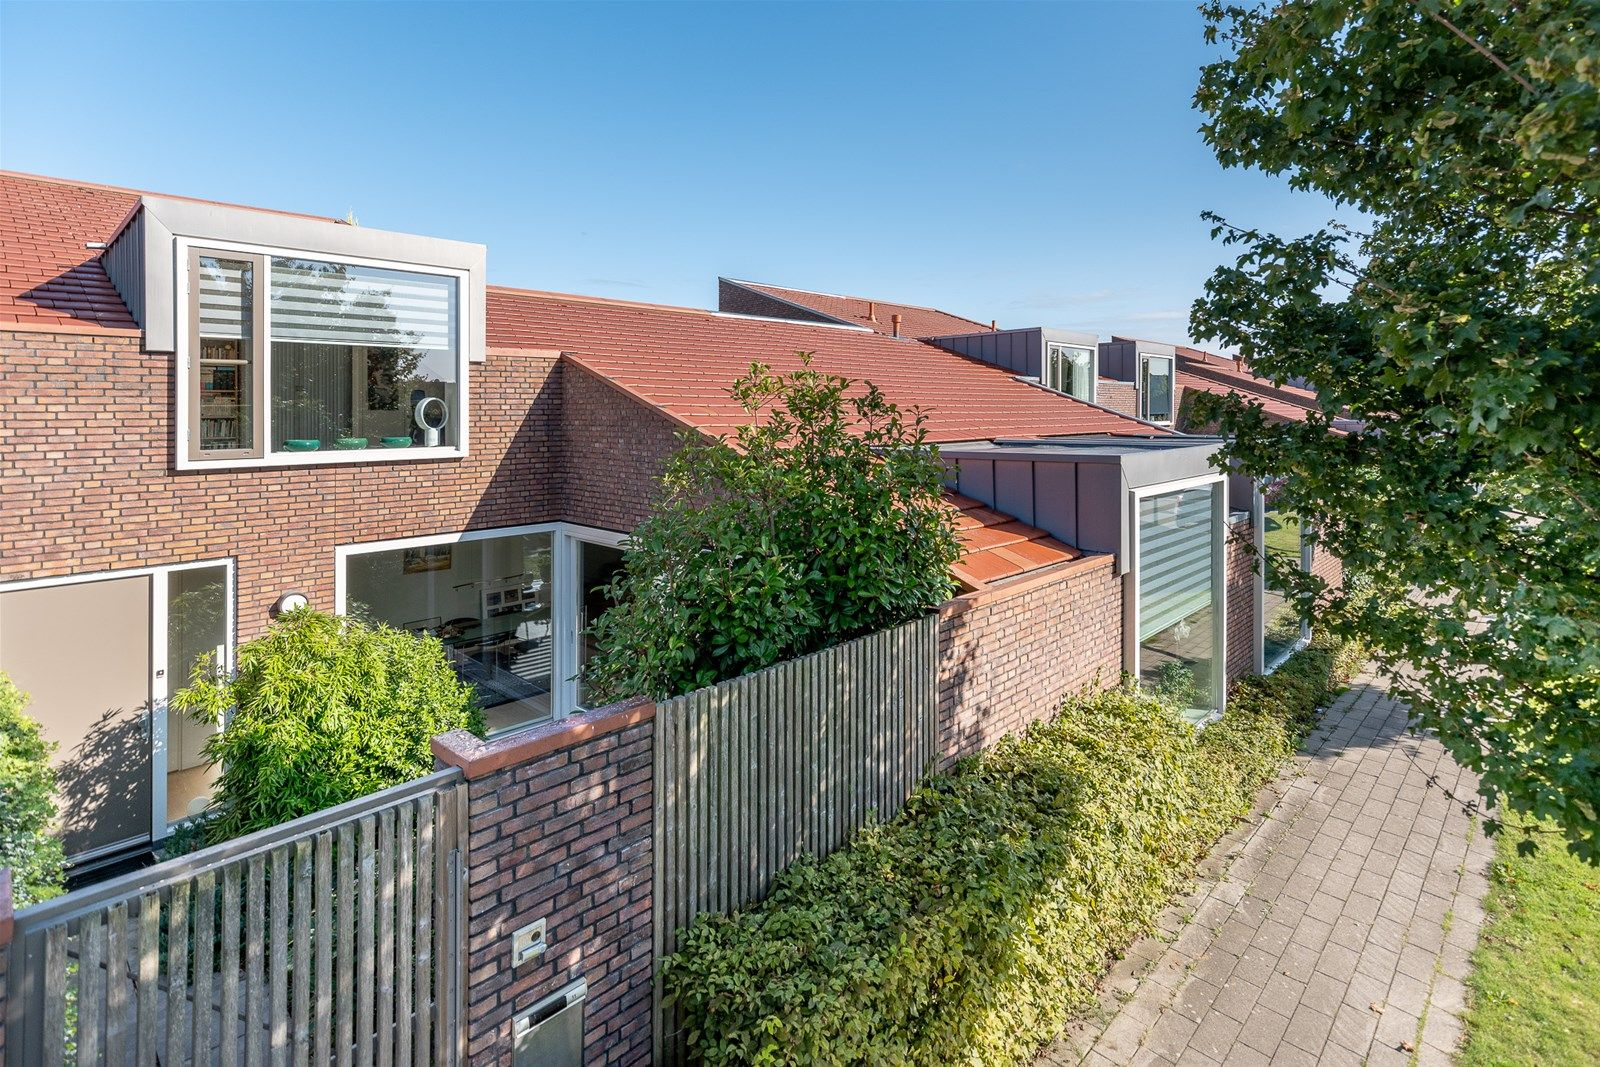 Helmstok 11, Almere